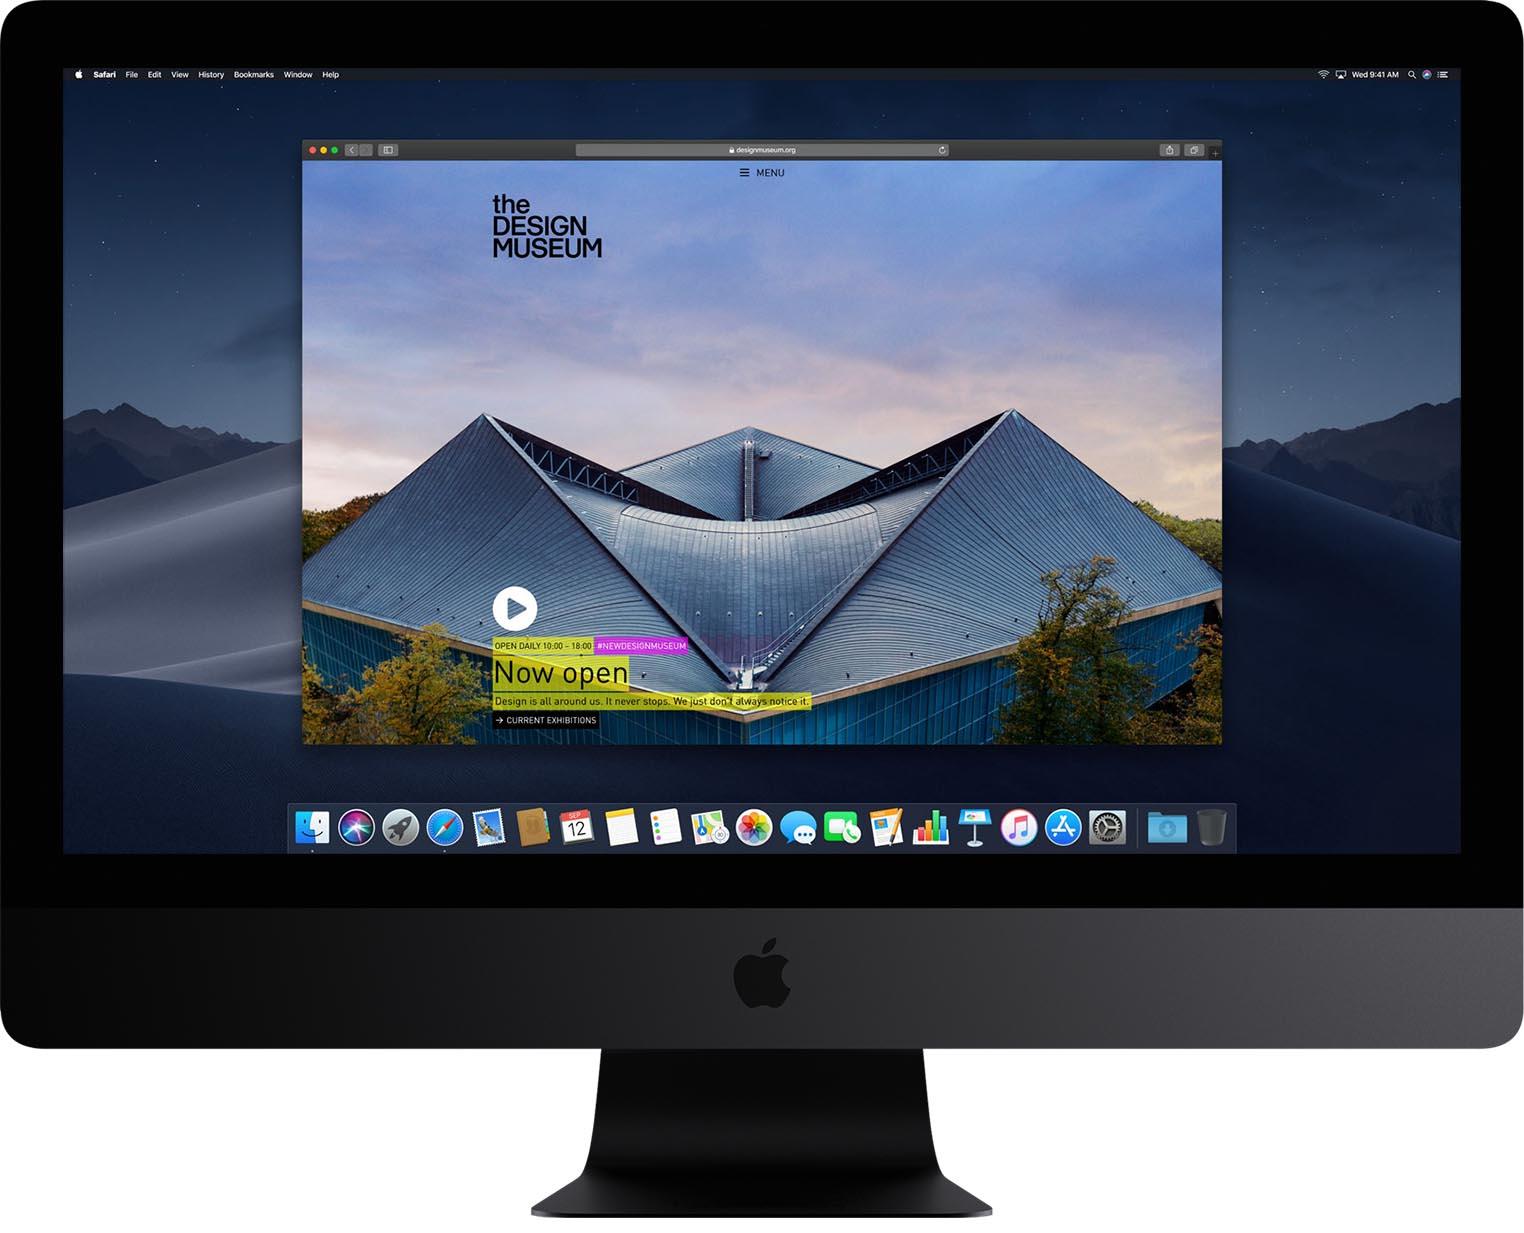 Safari iMac Mojave